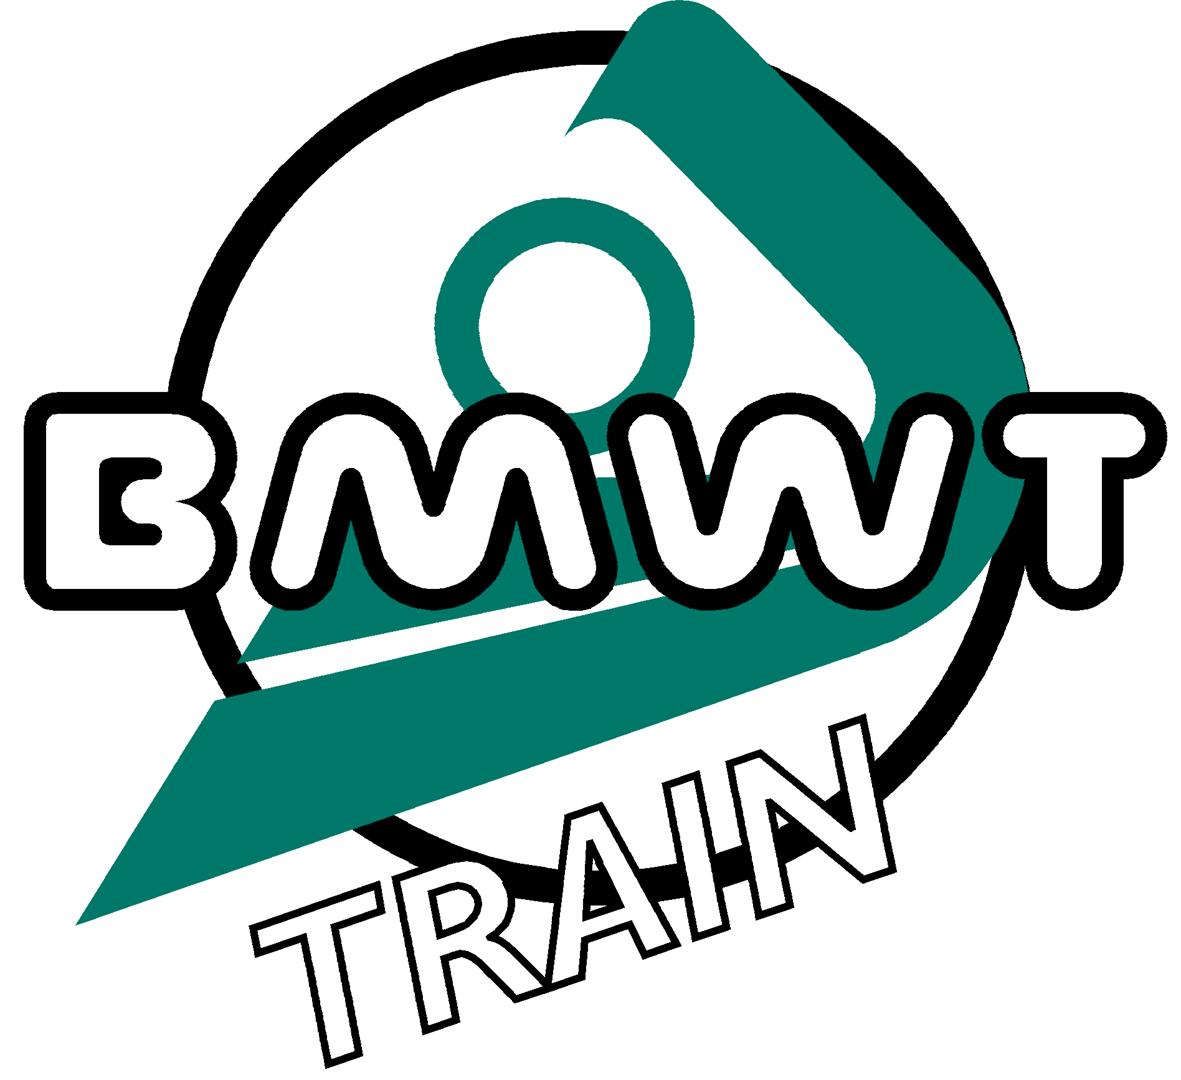 BMWT-Train logo